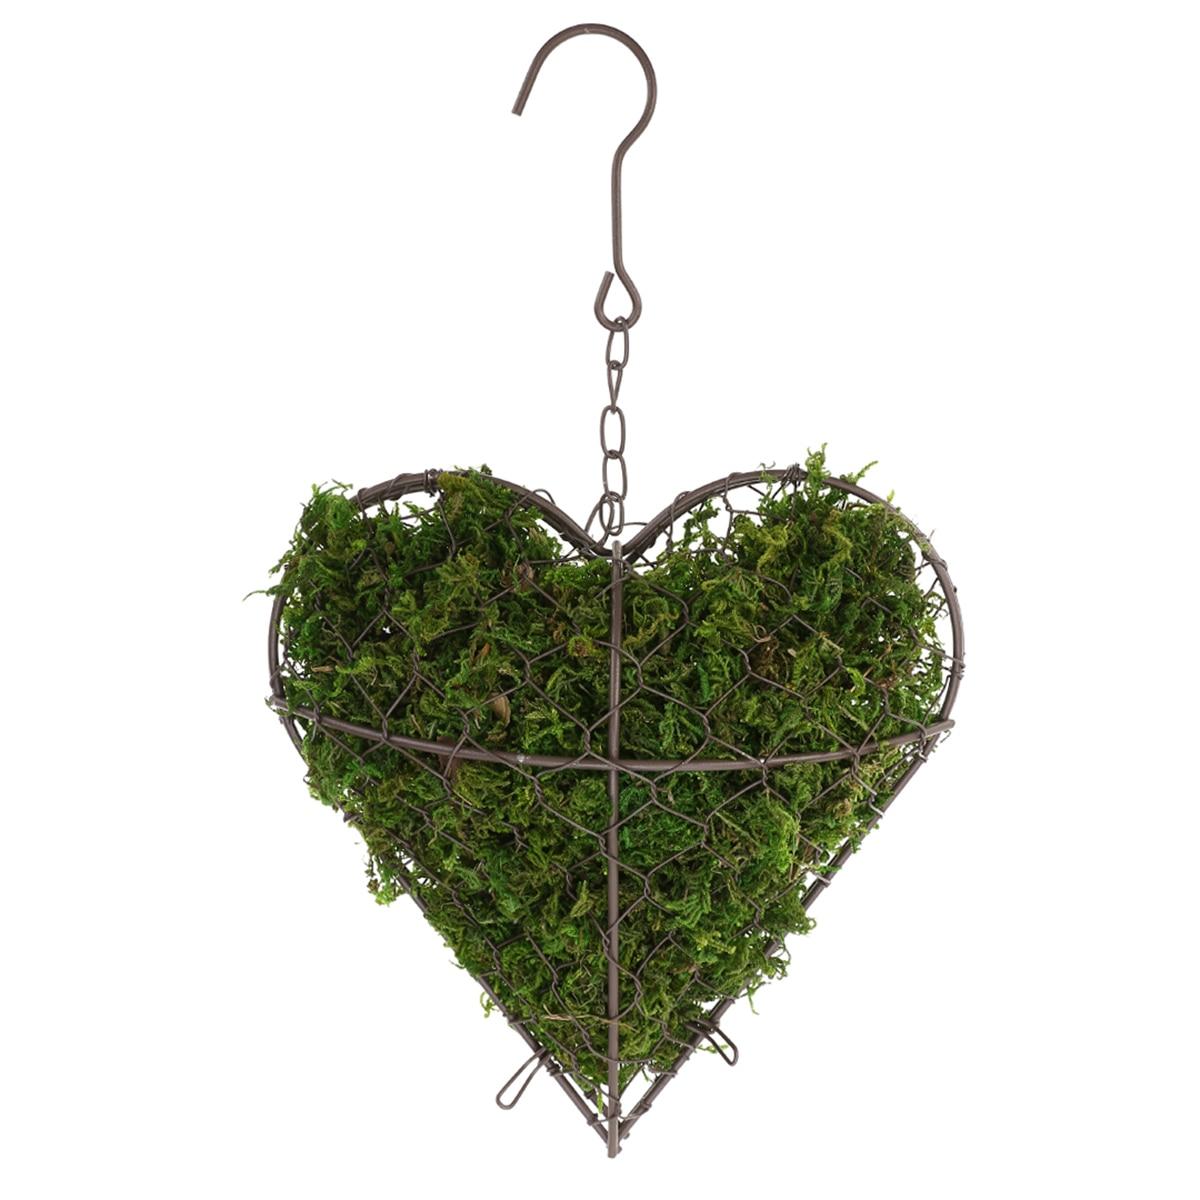 1pcs Metal Heart Shape Hanging Plant Basket Succulent Flower Pot Home Decoration Garden  Mayitr